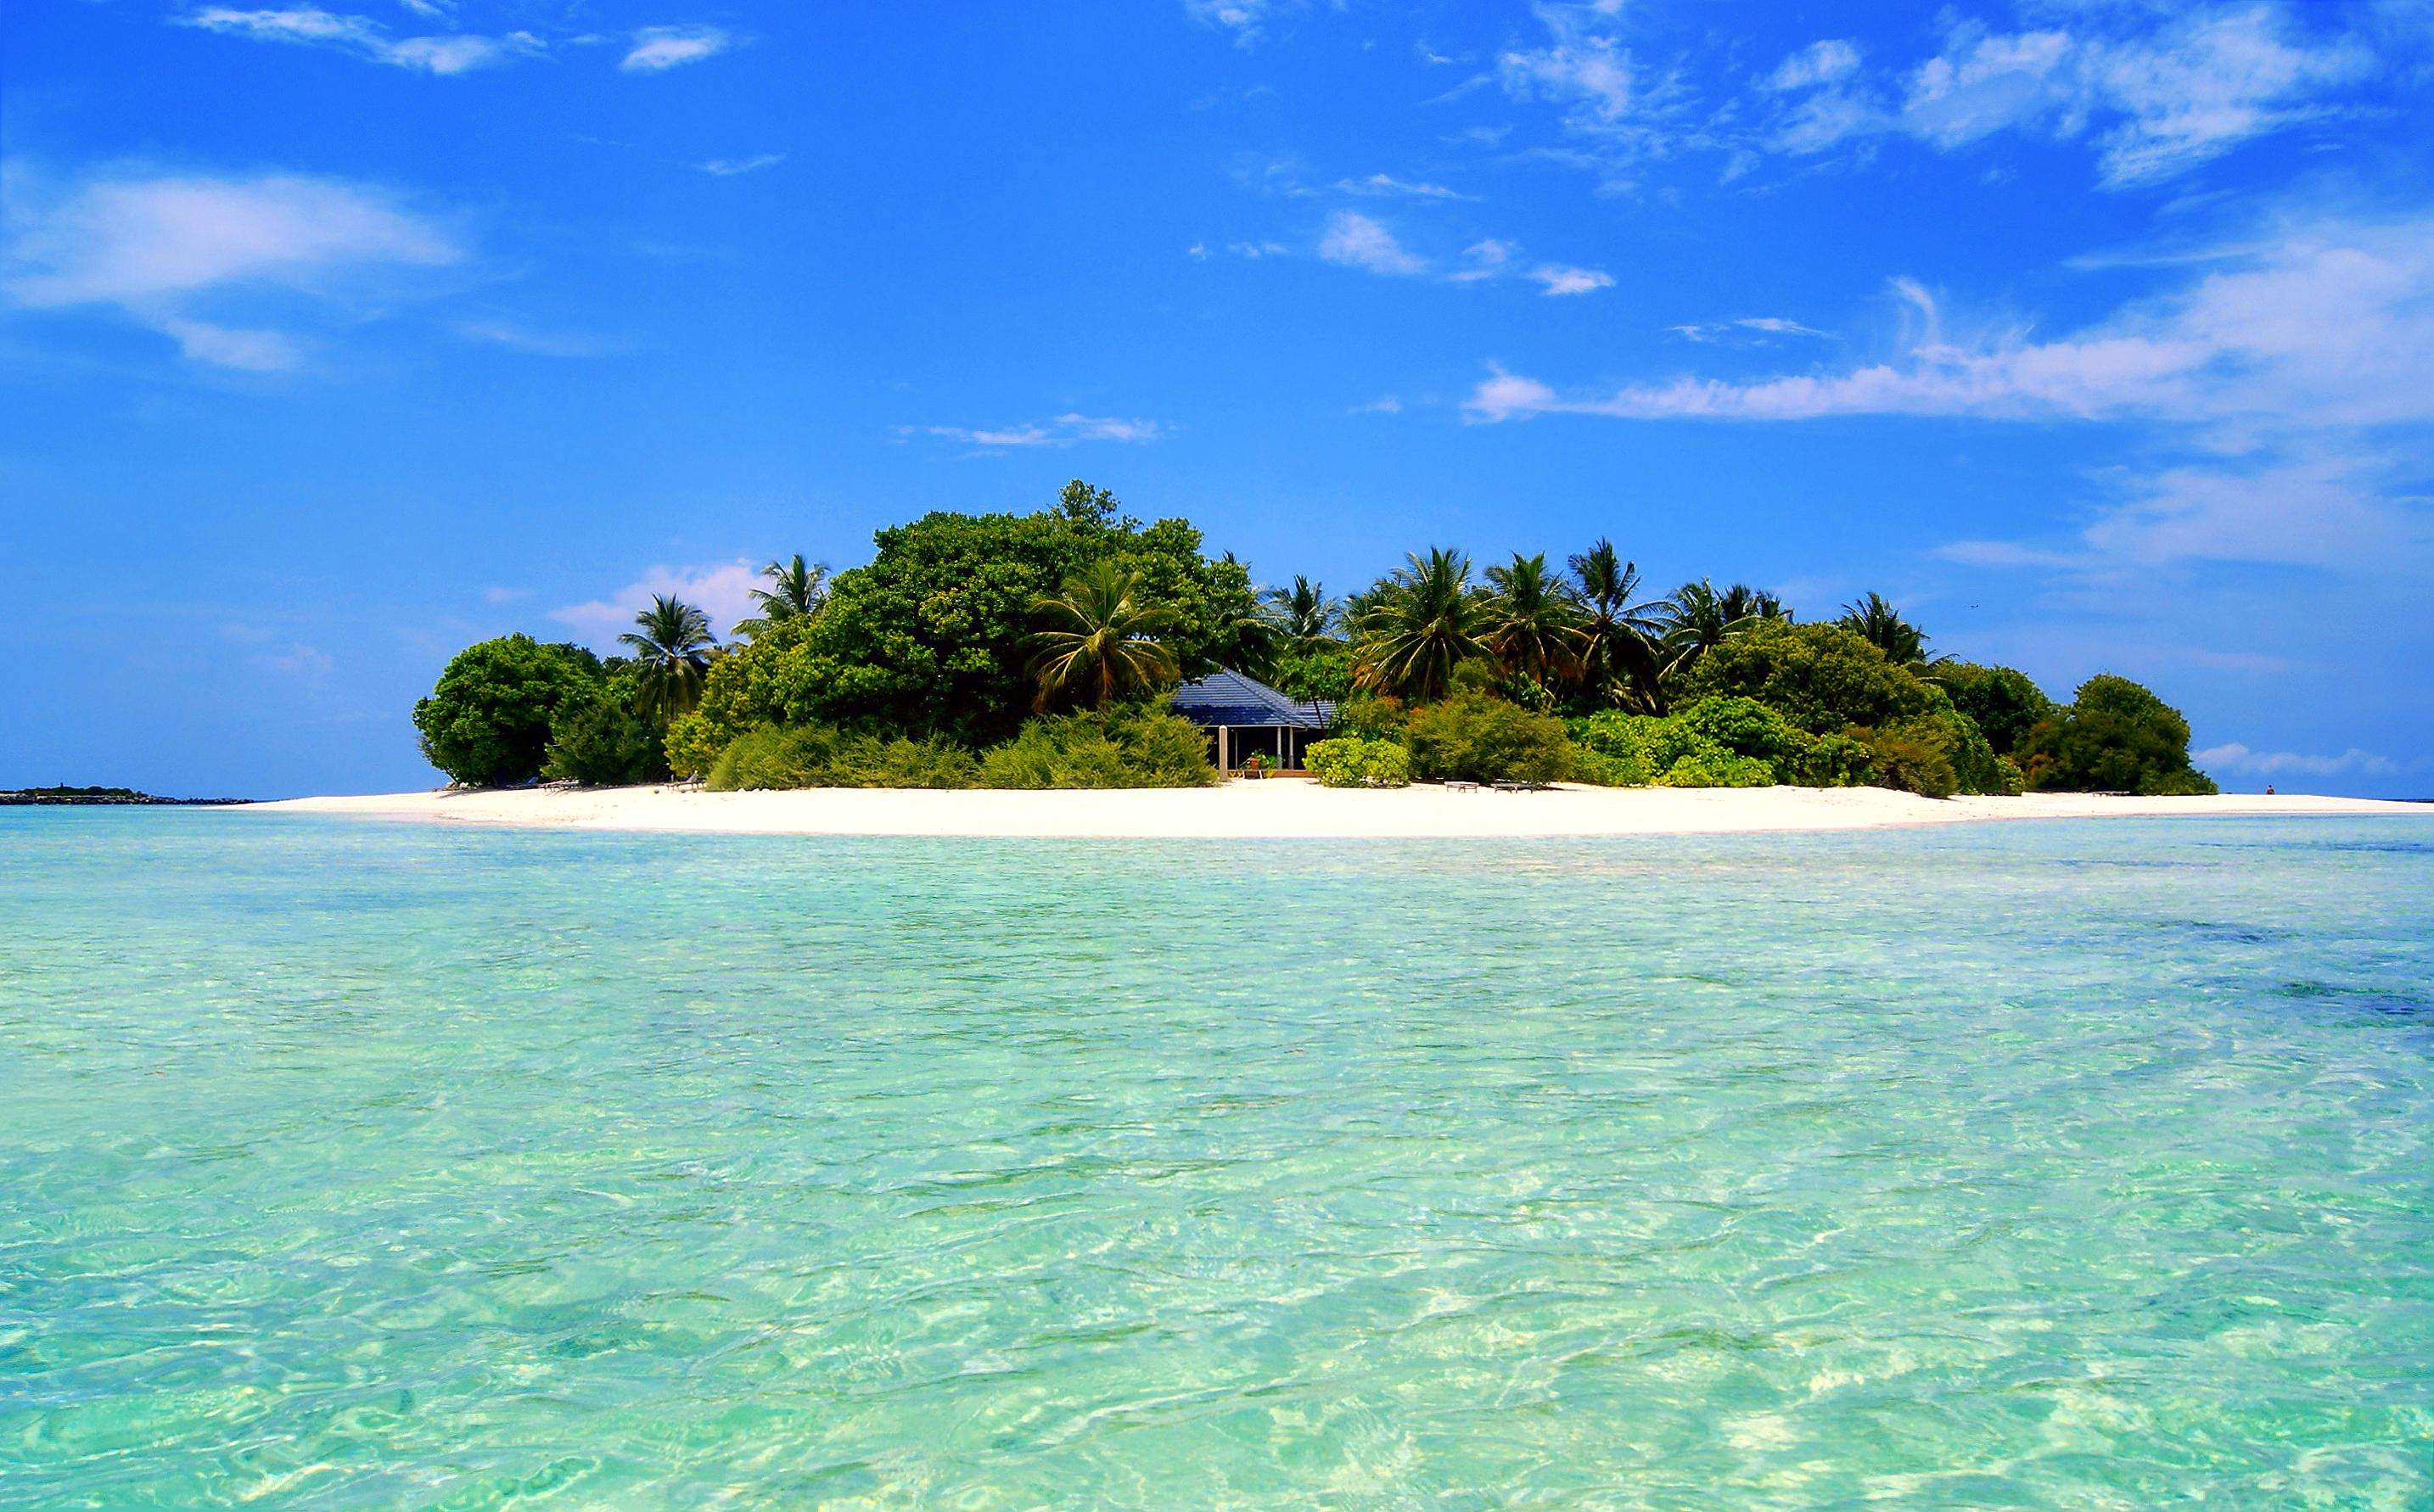 тропики, море, остров